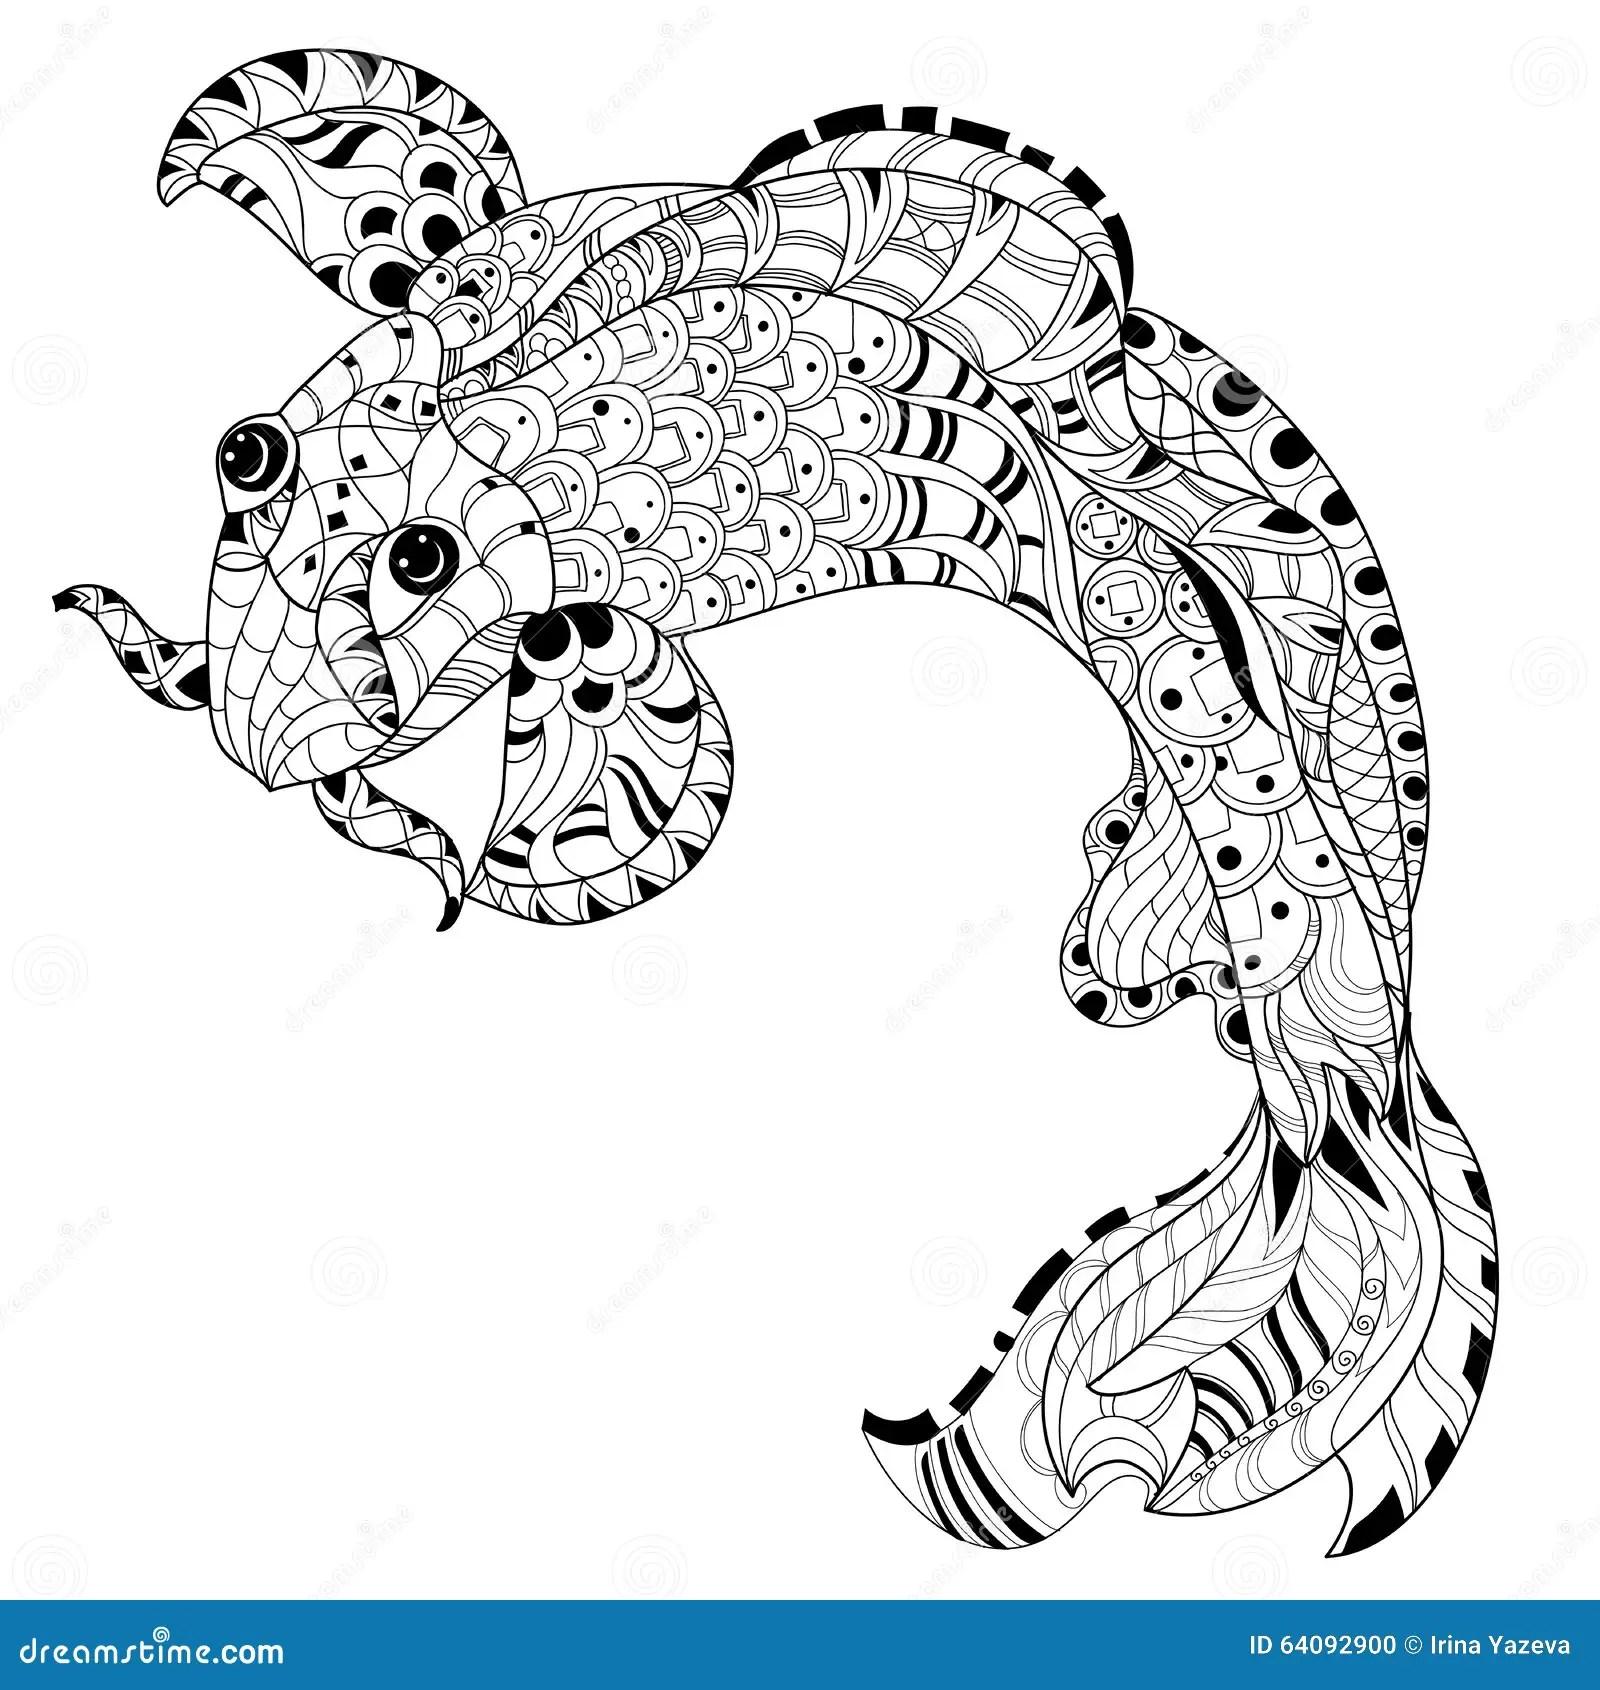 Zentangle Stylized Floral China Fish Carp Doodle Stock